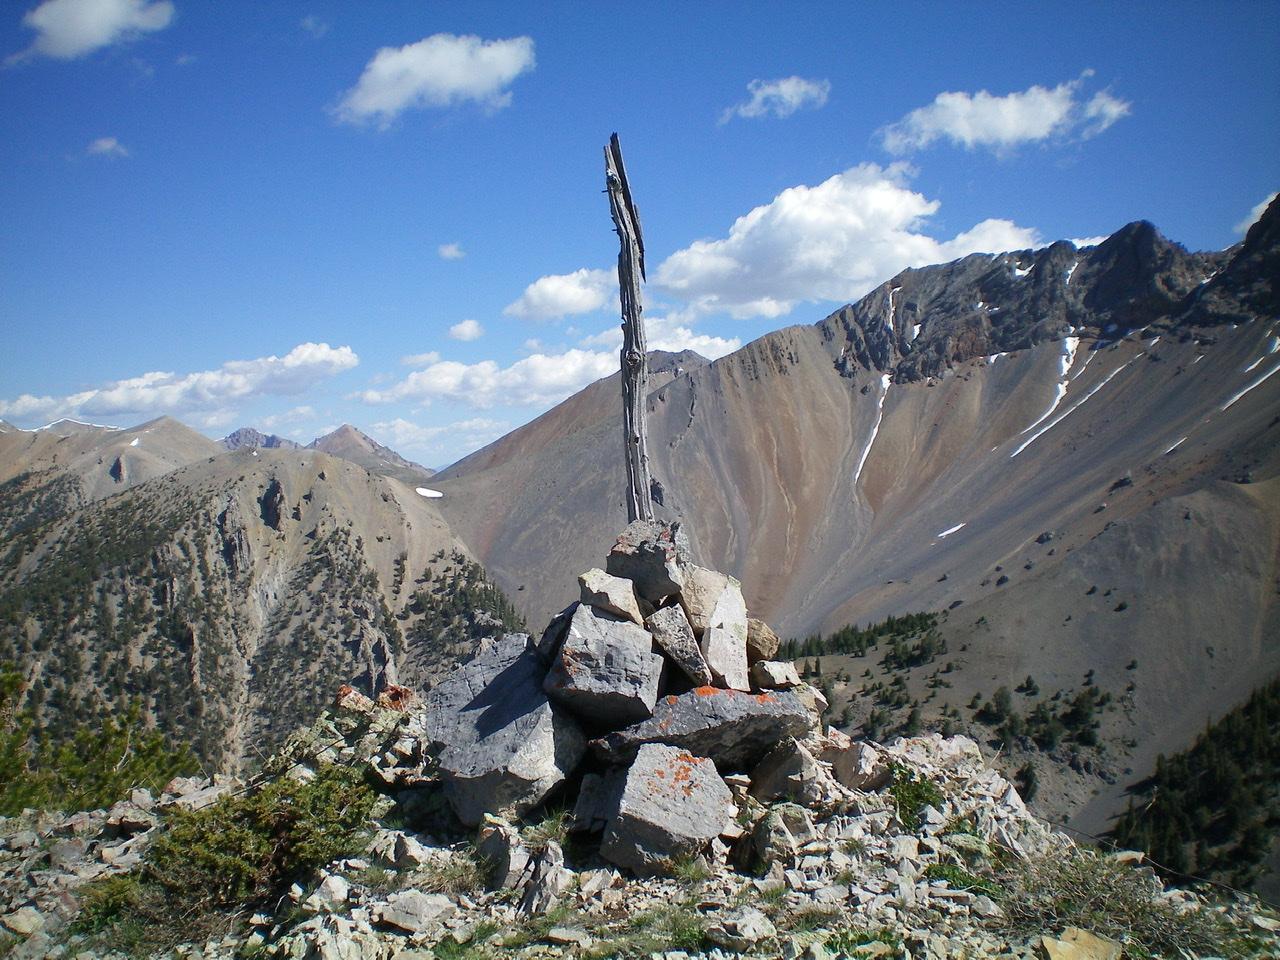 The summit cairn atop Peak 10104. Livingston Douglas Photo